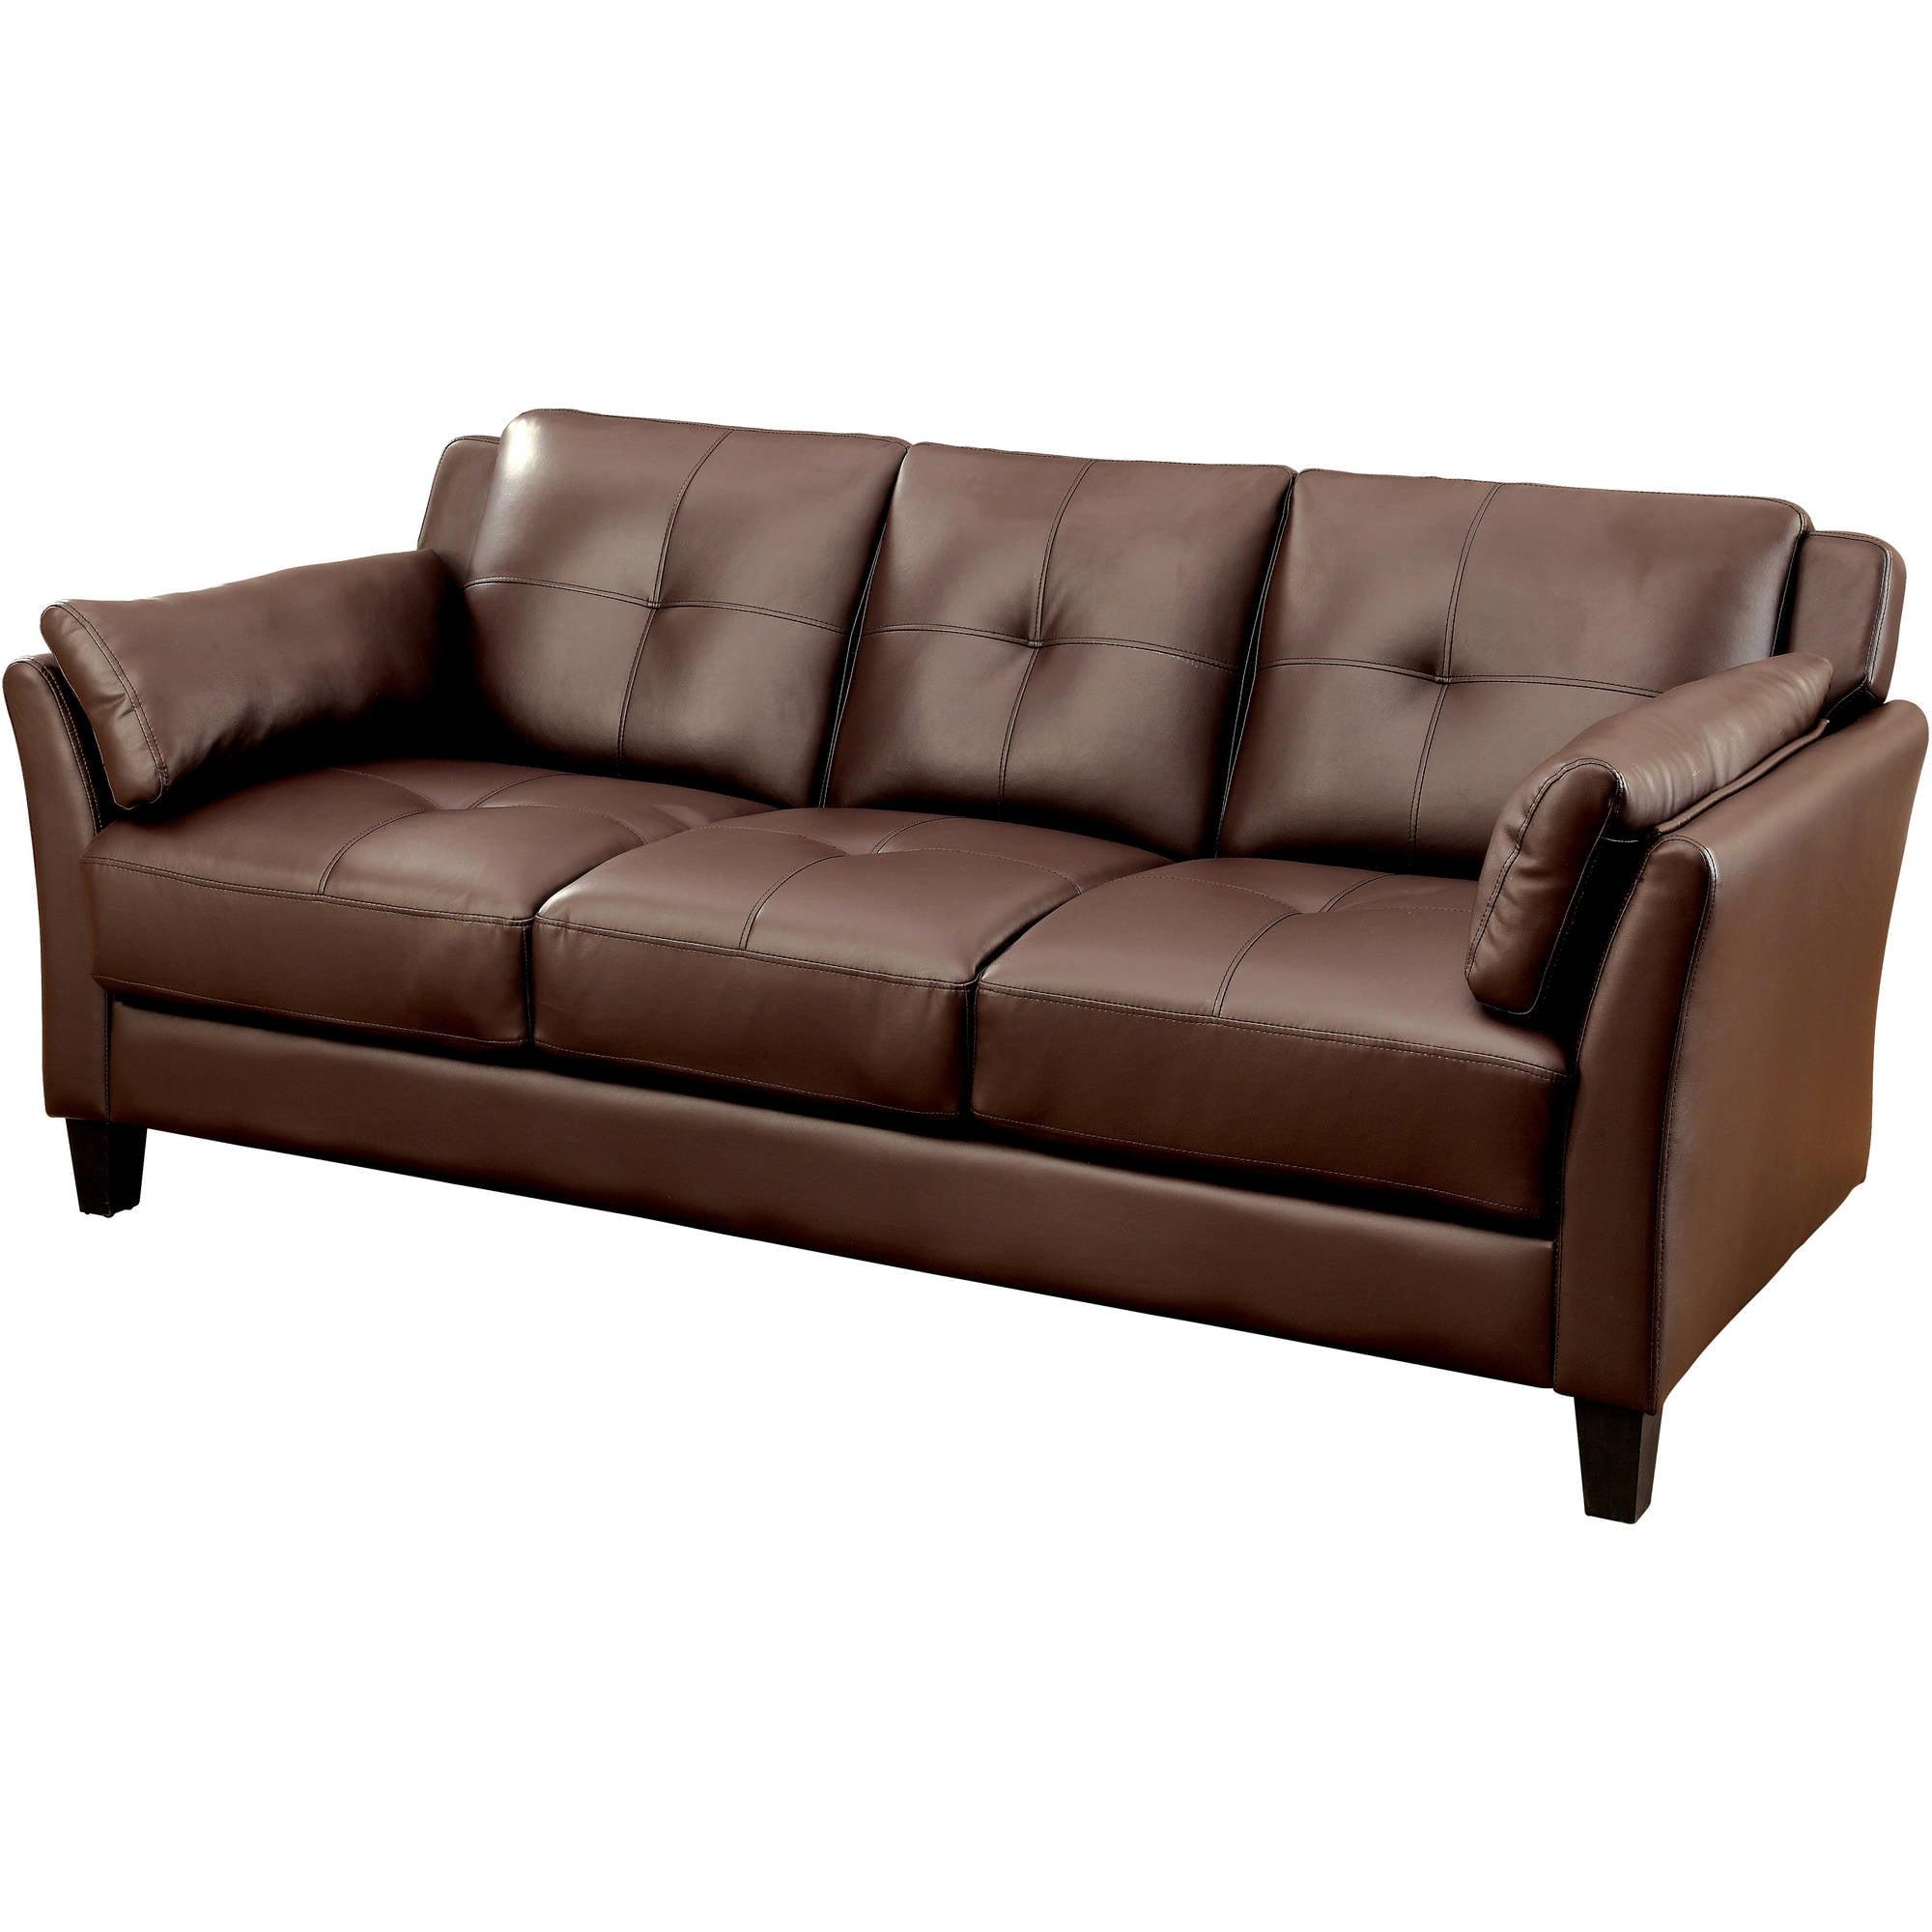 "Furniture of America Roseanne II Contemporary 75.5"" Sofa, Multiple Colors"